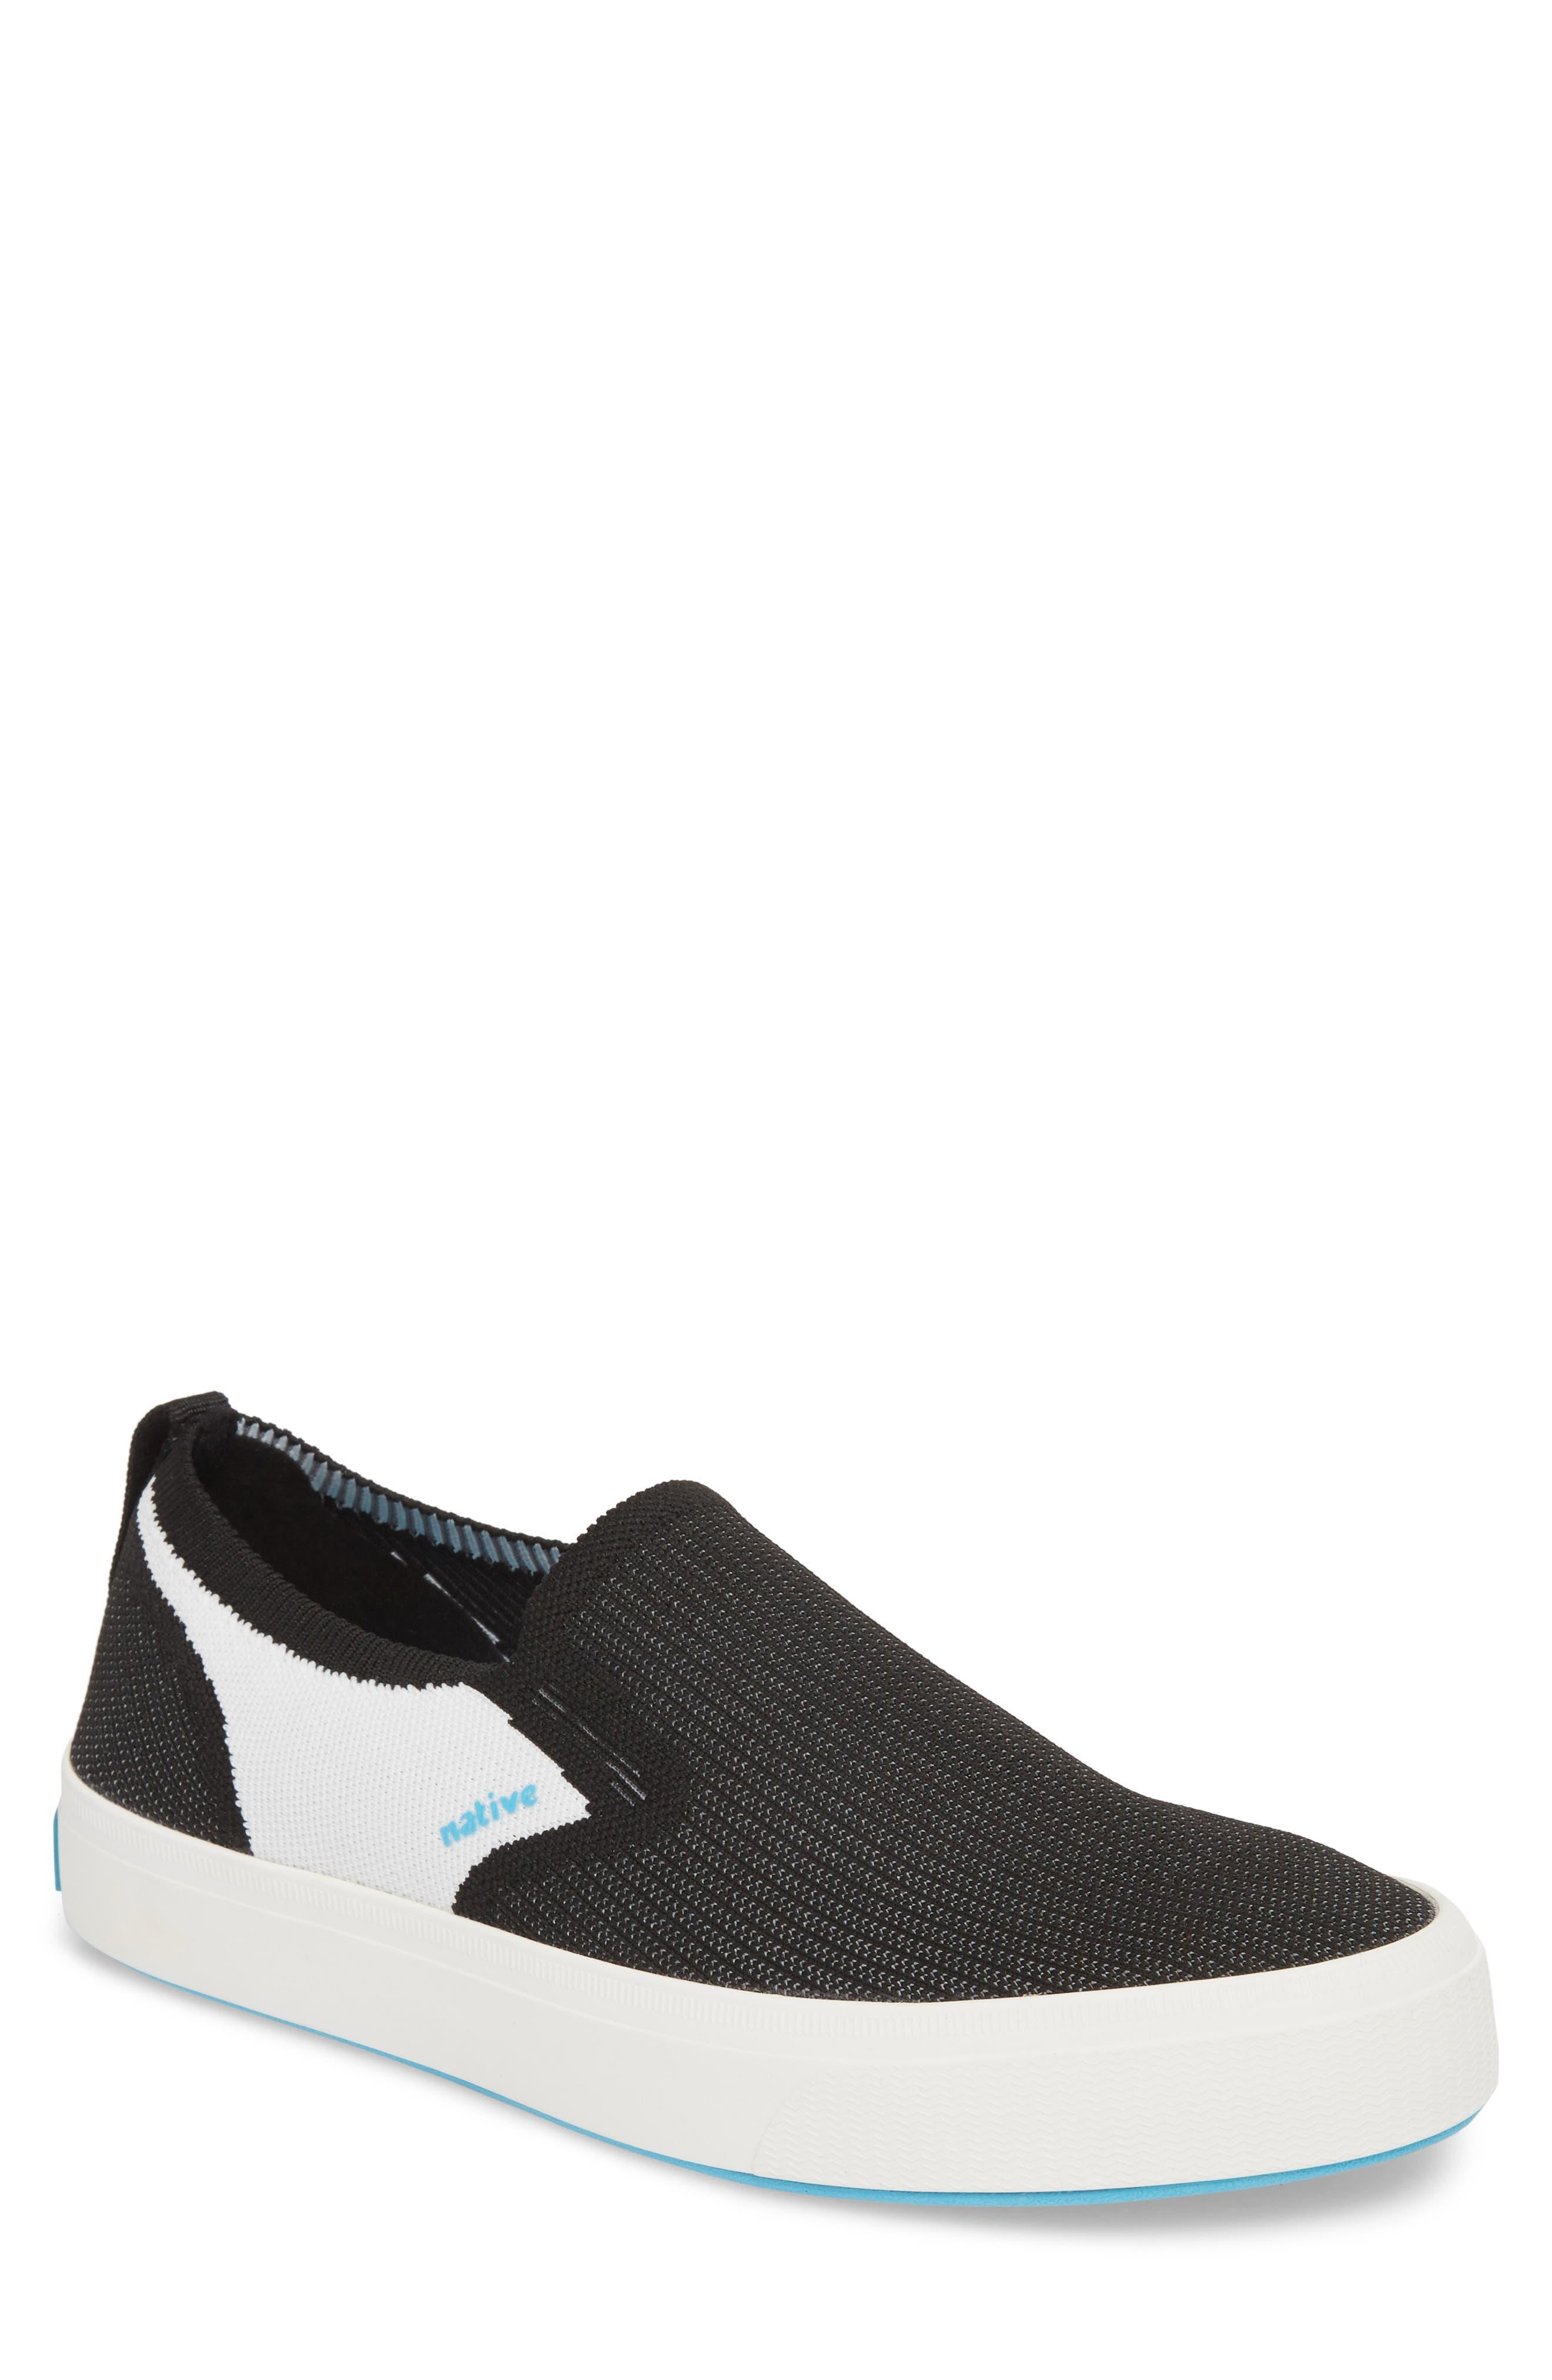 Native Miles LiteKnit Slip-On Sneaker,                         Main,                         color, JIFFY BLACK/ SHELL WHITE